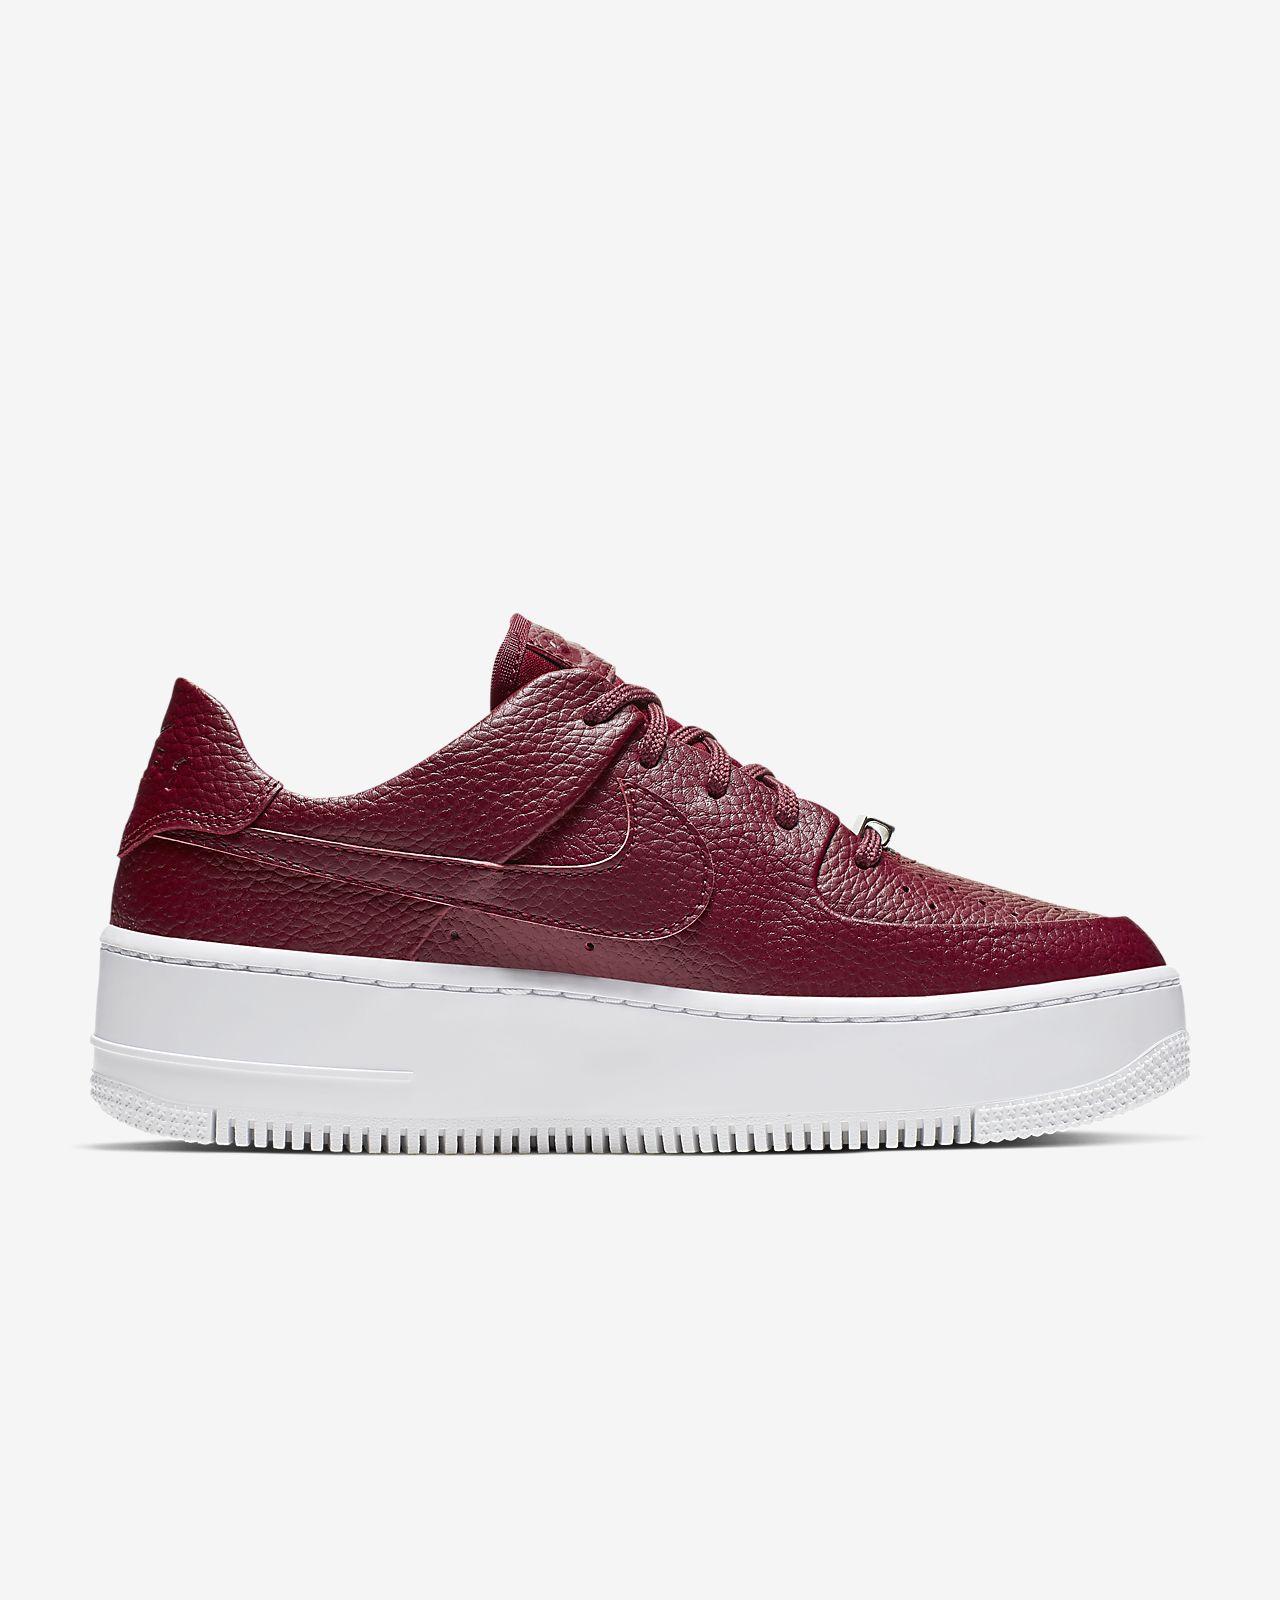 1ea1f5d3b3b Nike Air Force 1 Sage Low Women's Shoe